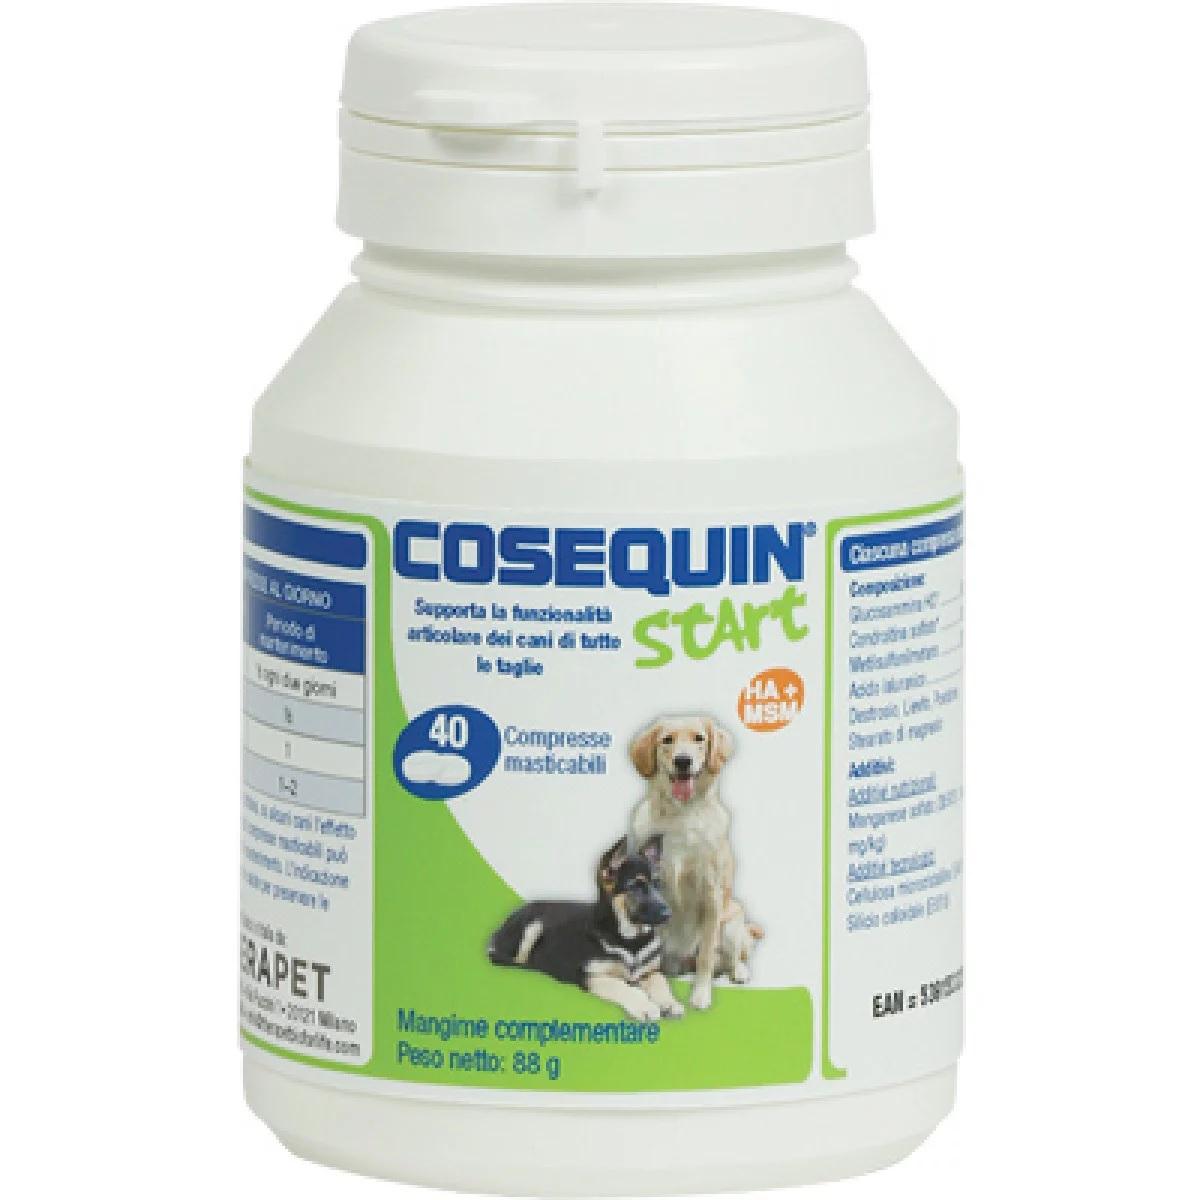 Image of Cosequin Start: 40 compresse